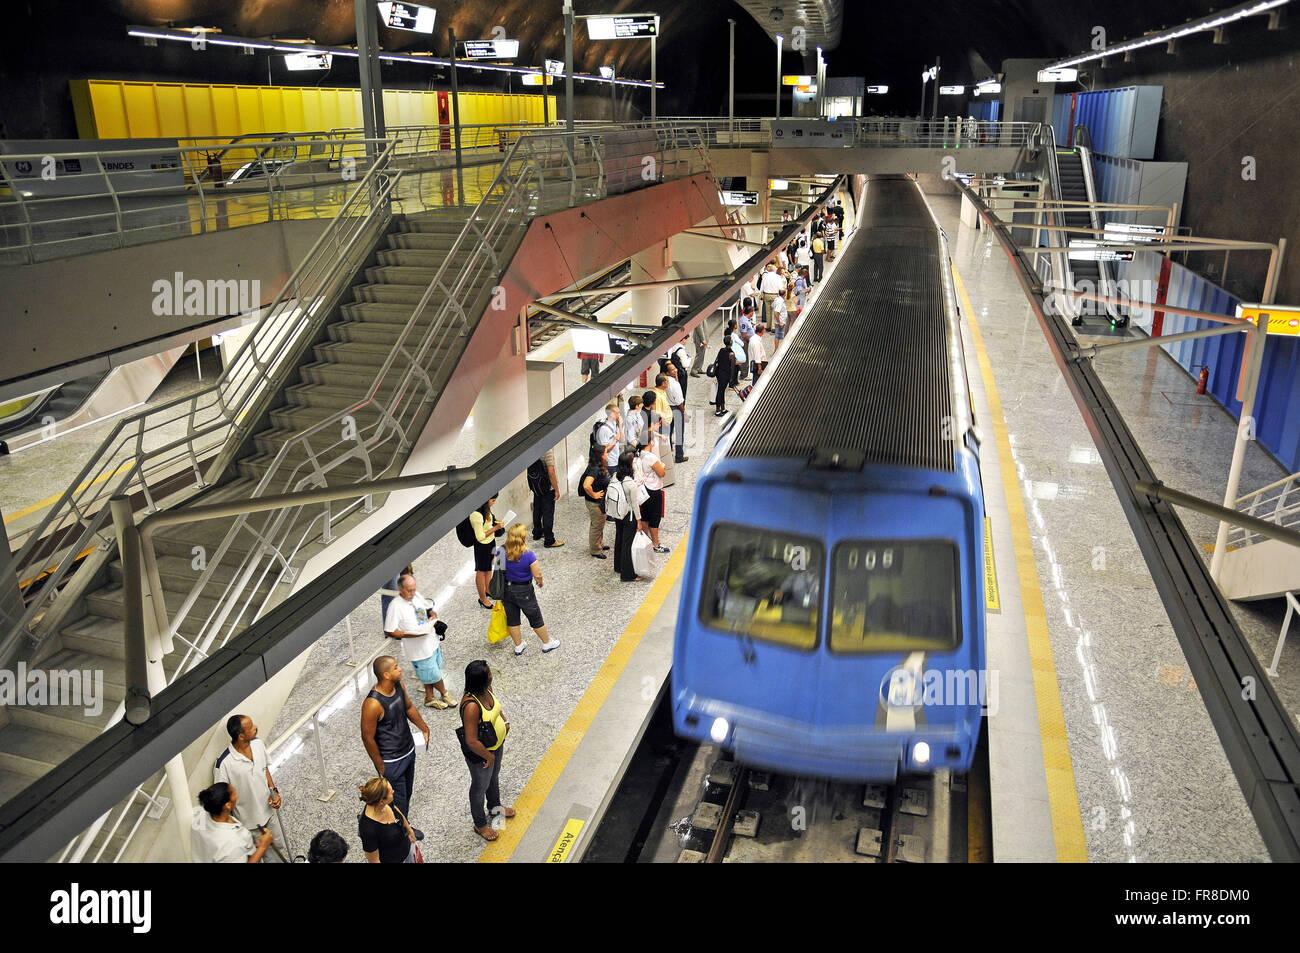 Inside the subway station of the city of Rio de Janeiro - Stock Image